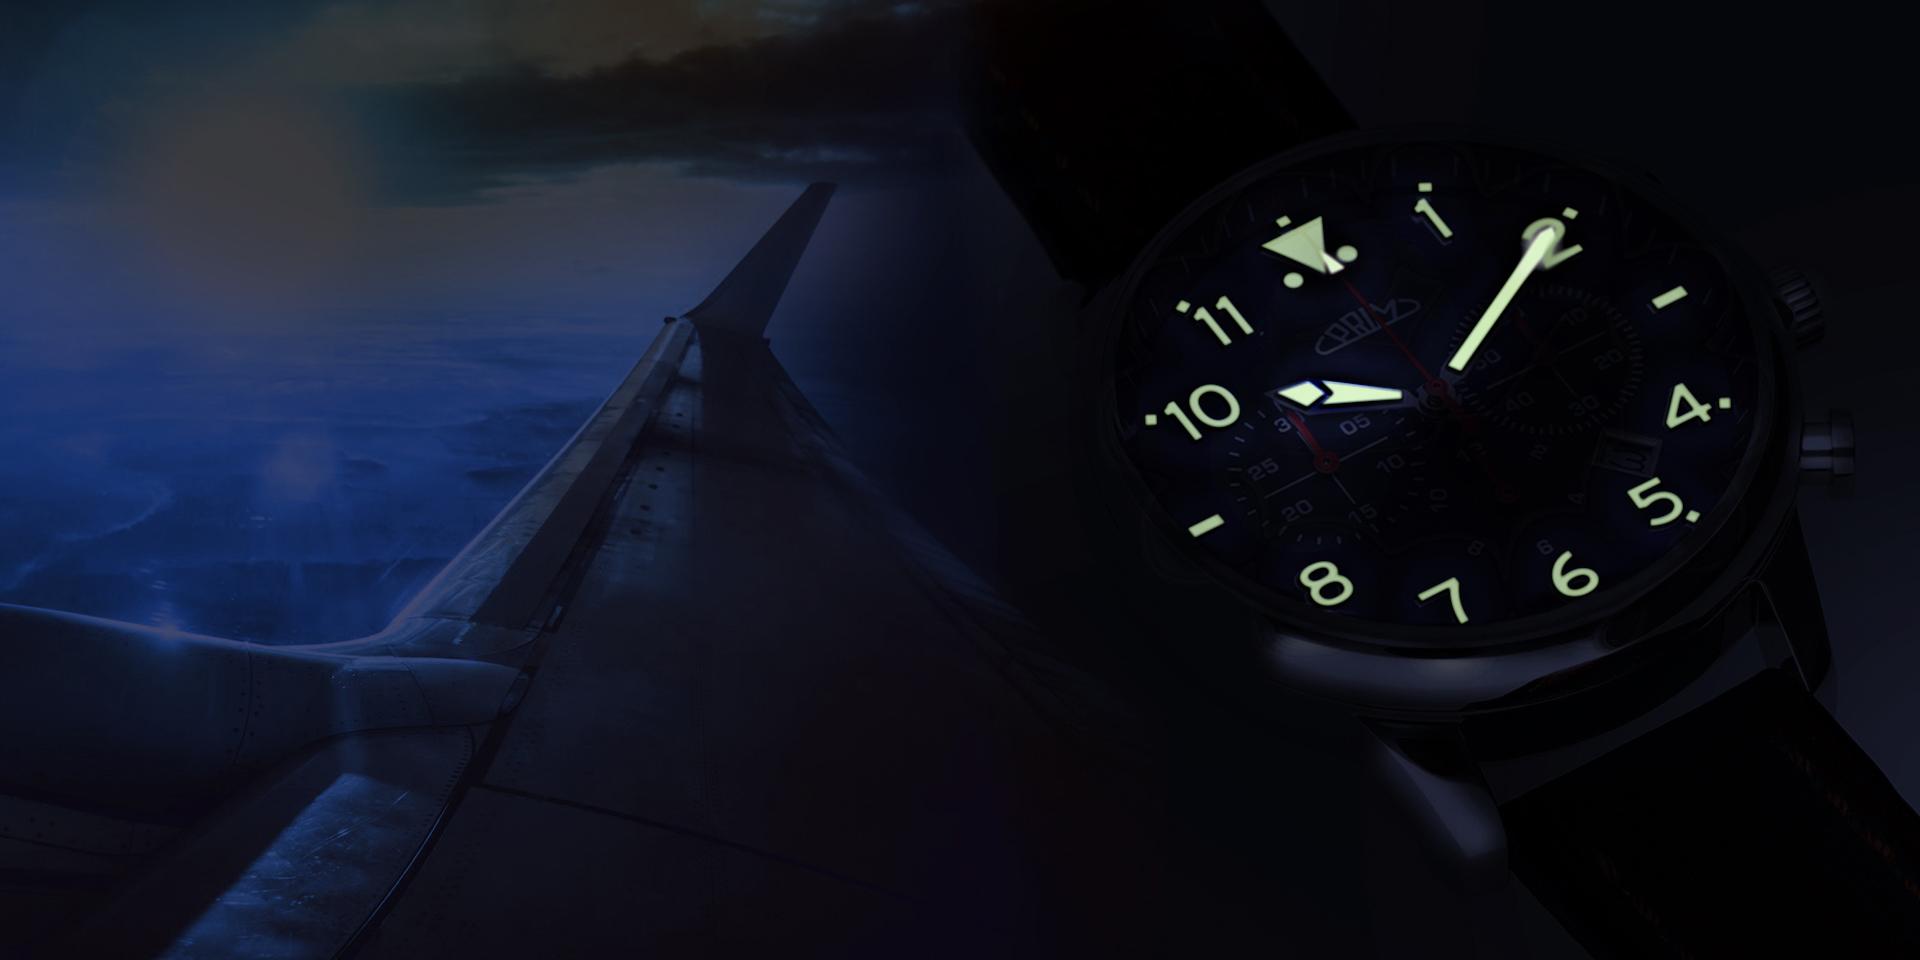 PILOT-CHRONO-AUTOMATIC_banner-1920x960.jpg